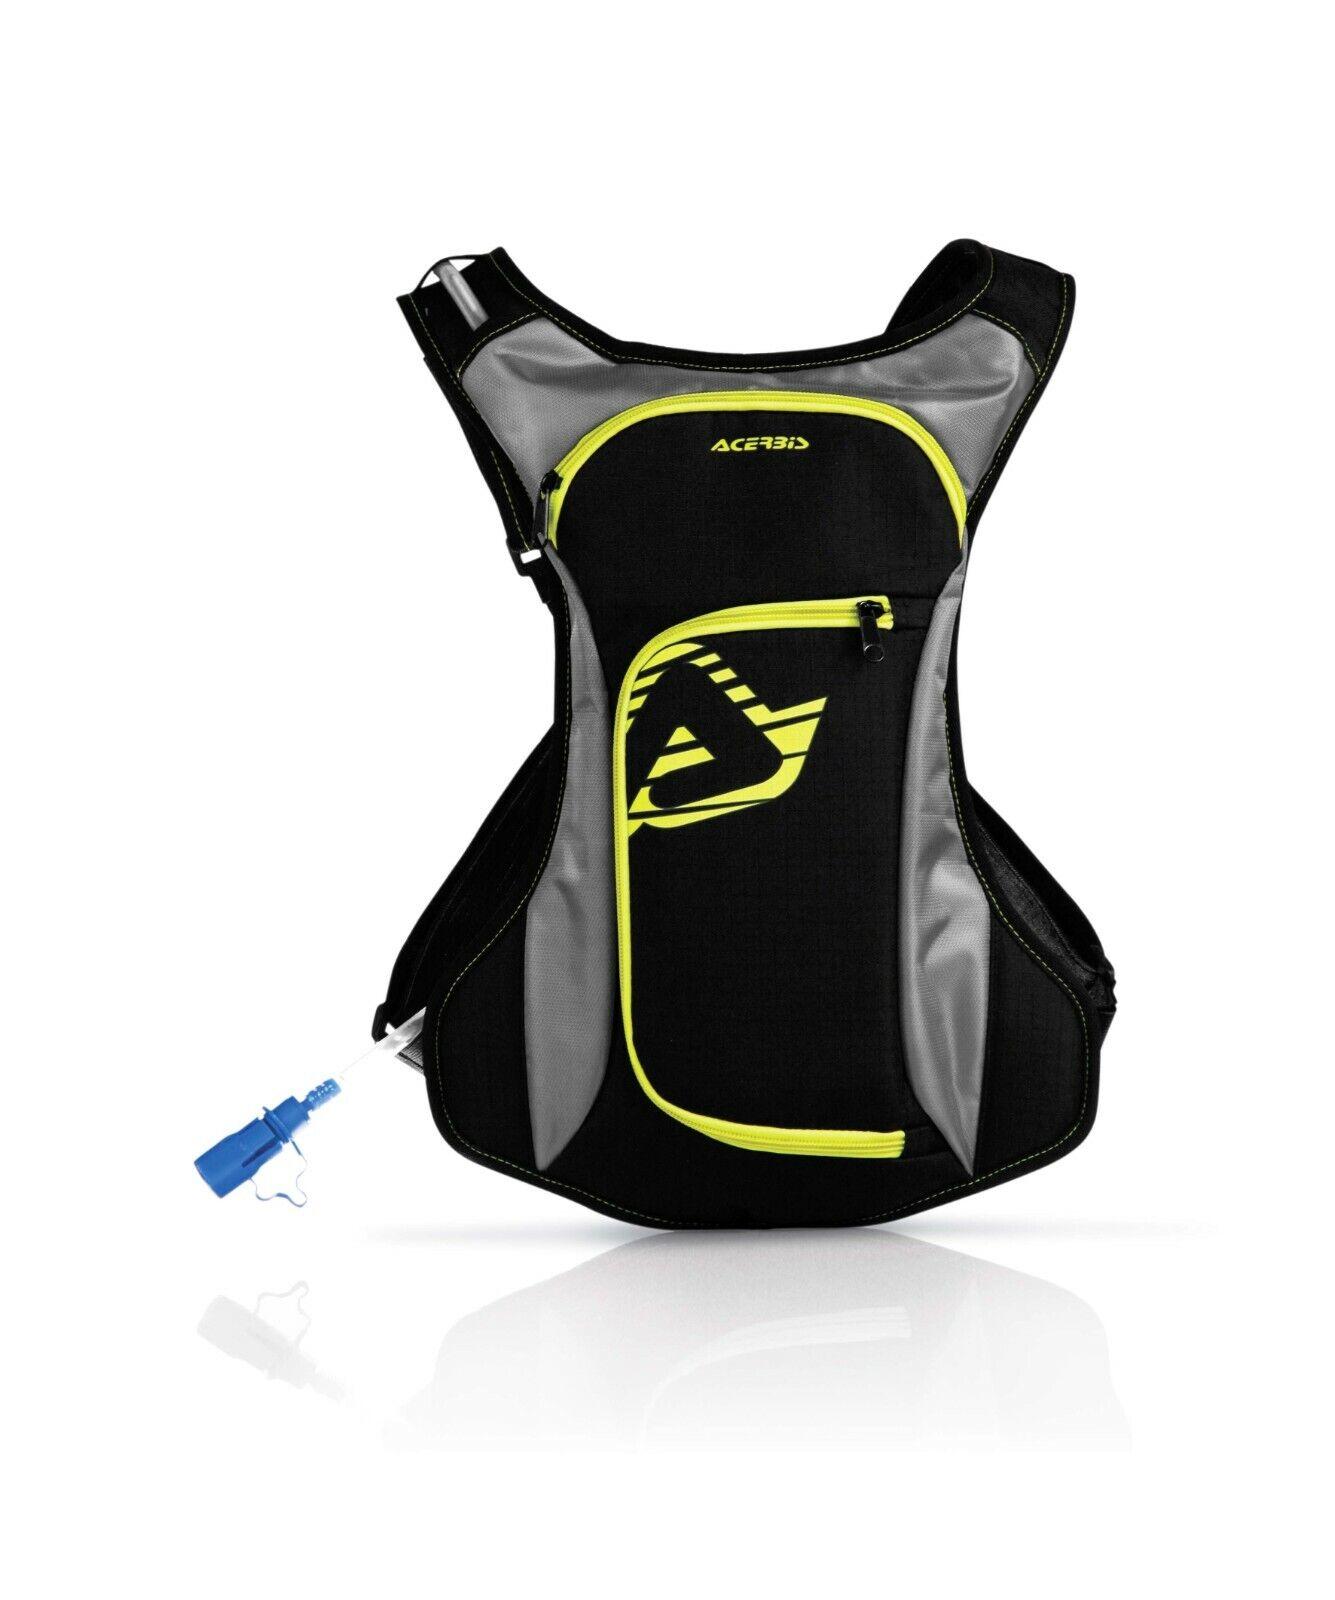 Zaino Moto Cross Camel Bag ACERBIS ACQUA giallo fluo Enduro Mtb Downhill Drink